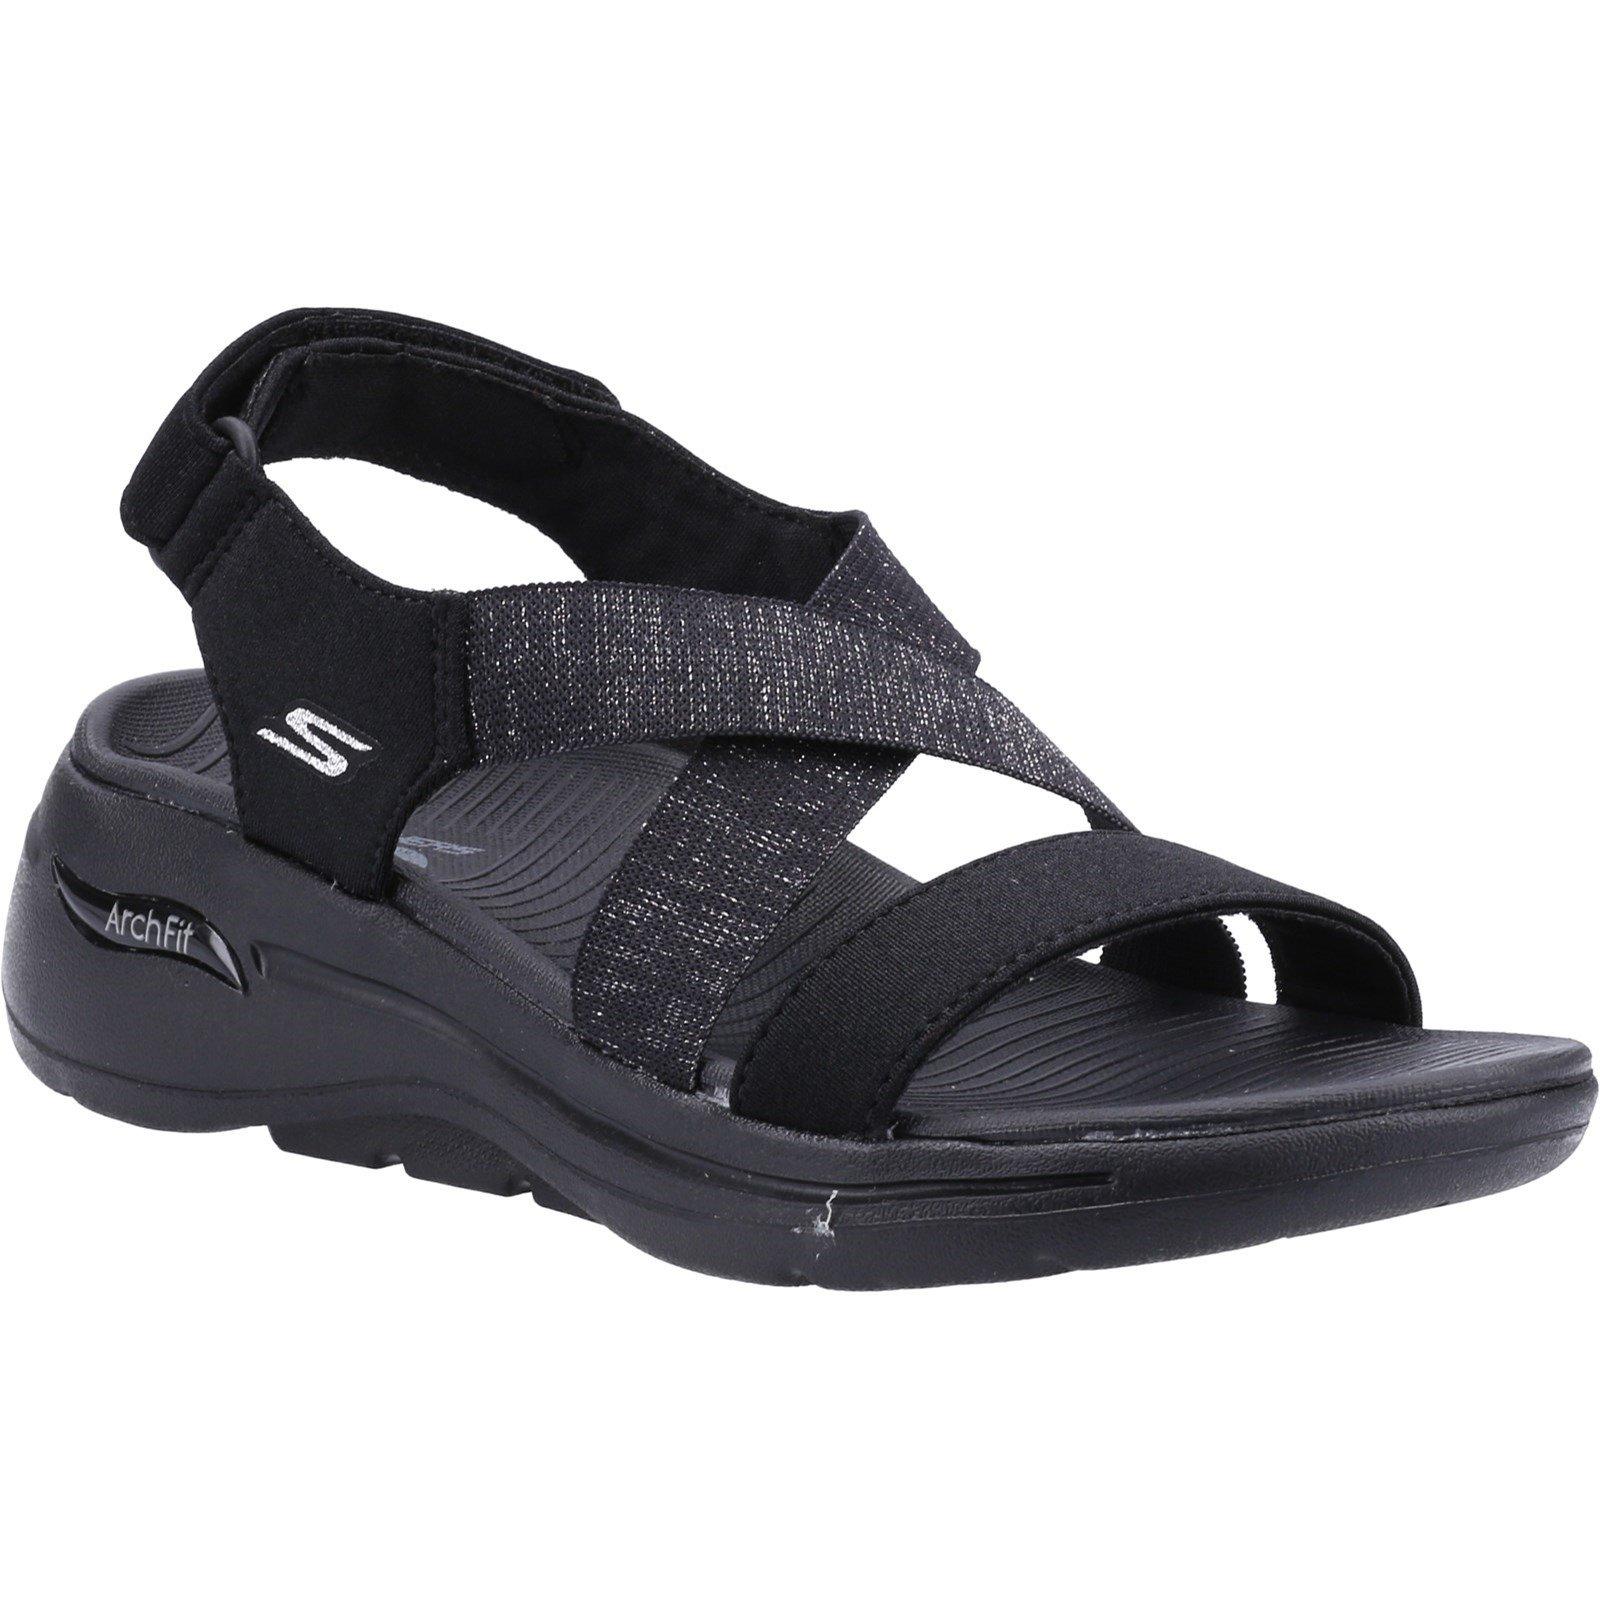 Skechers Women's Go Walk Arch Fit Astonish Summer Sandal Various Colours 32153 - Black 6